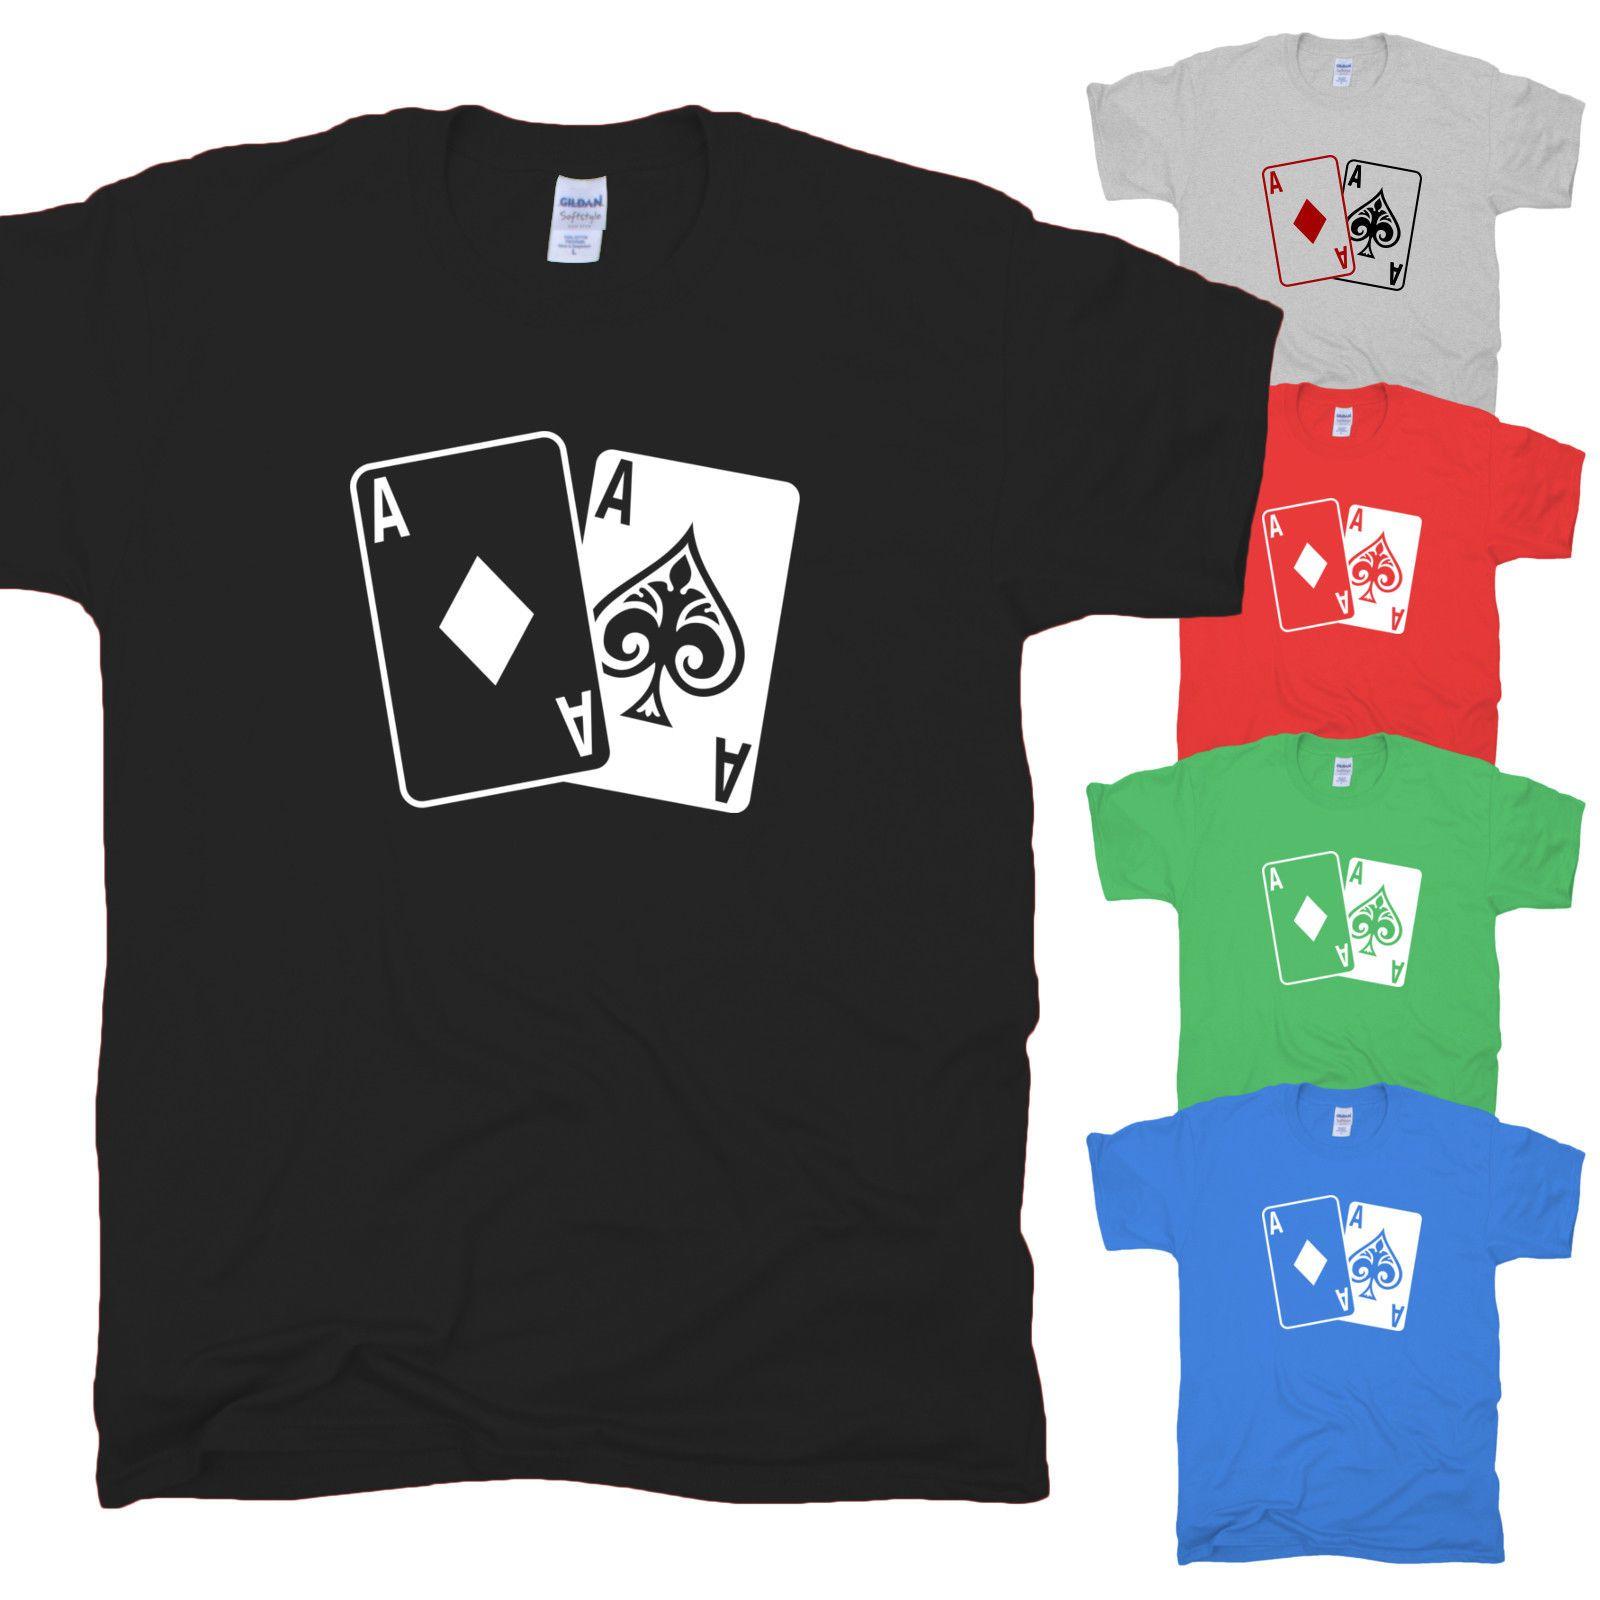 Poker Cards Karten Ass All In Texas Hold Em Ace Spades Game Vegas T Shirt S Xxl As T Shirts Fun Tee Shirts From Xsy18tshirt 12 05 Dhgate Com